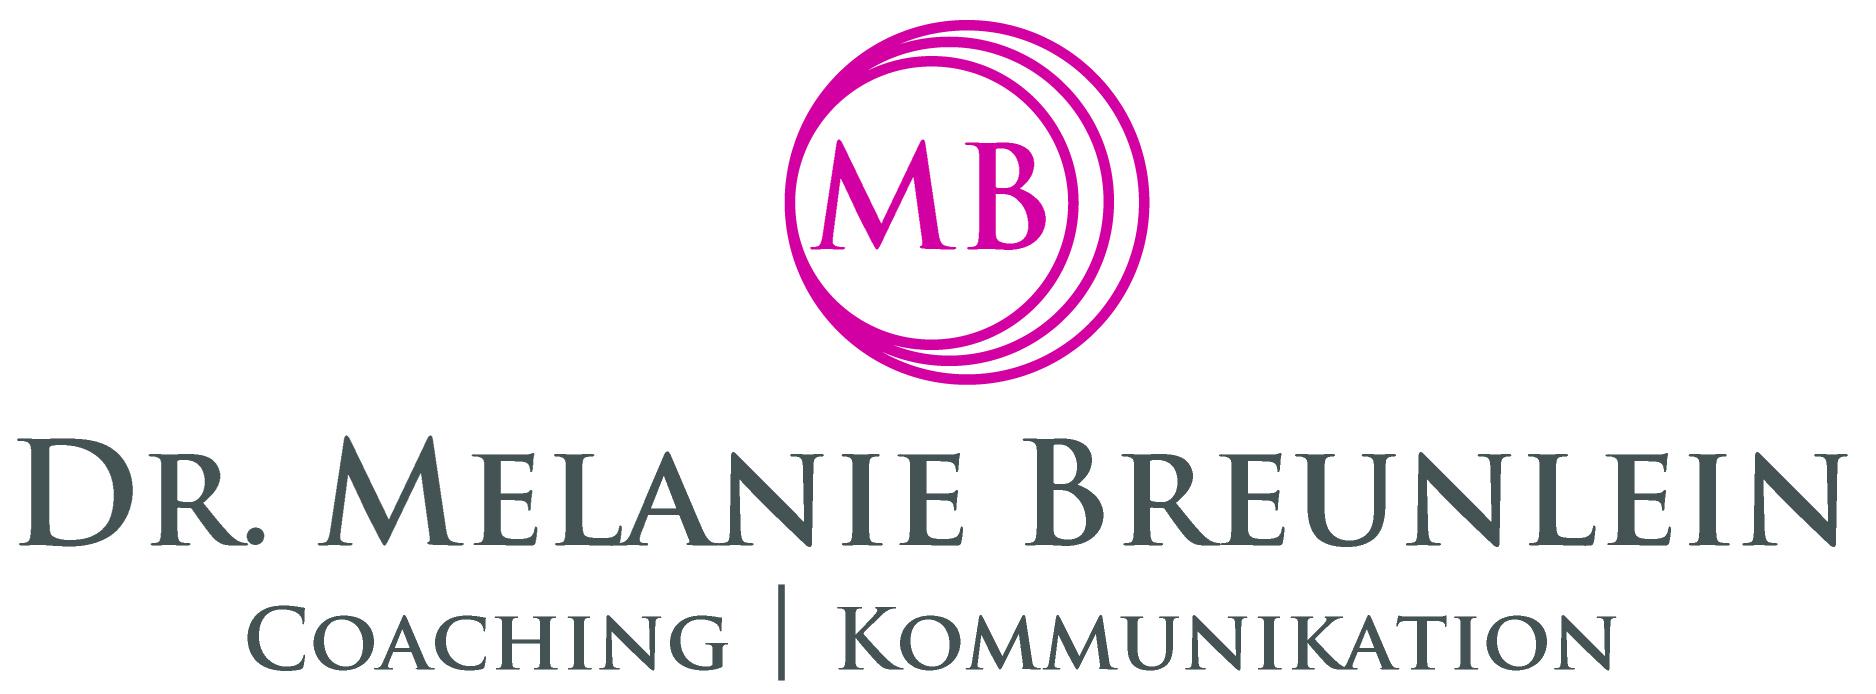 Dr. Melanie Breunlein